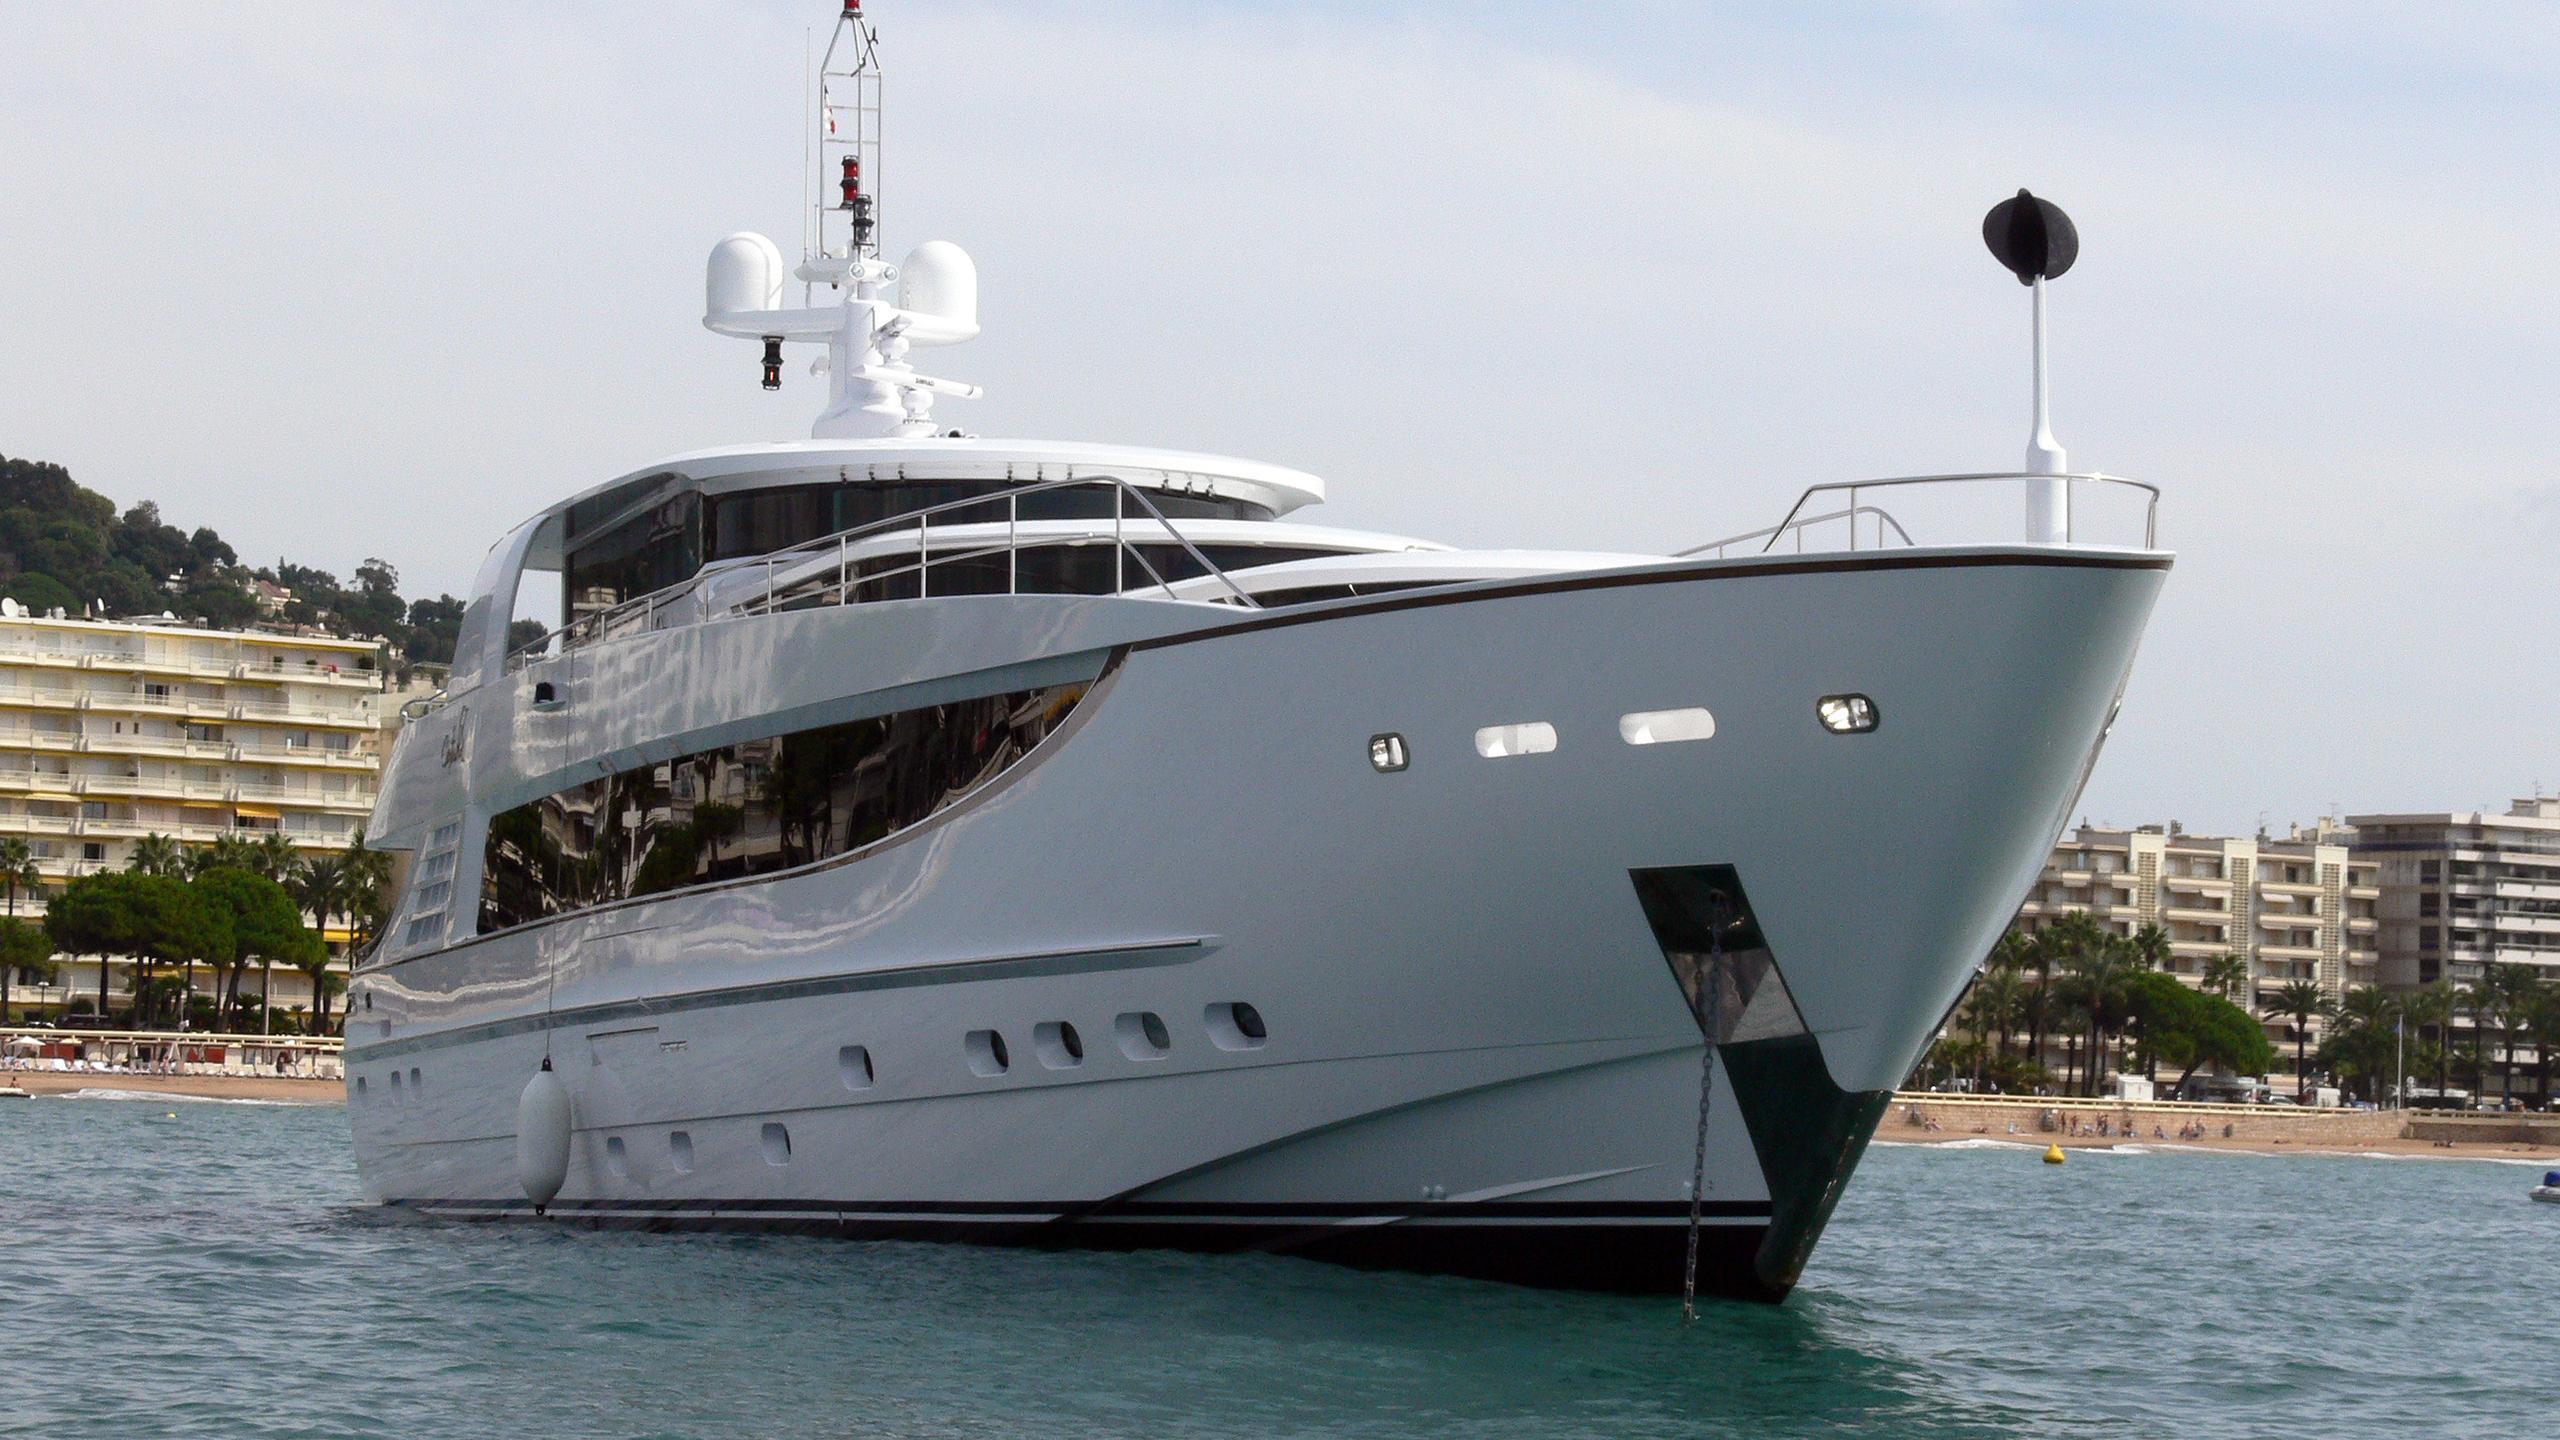 seva-motor-yacht-kaiserwerft-baron-40-5-2006-41m-profile-bow